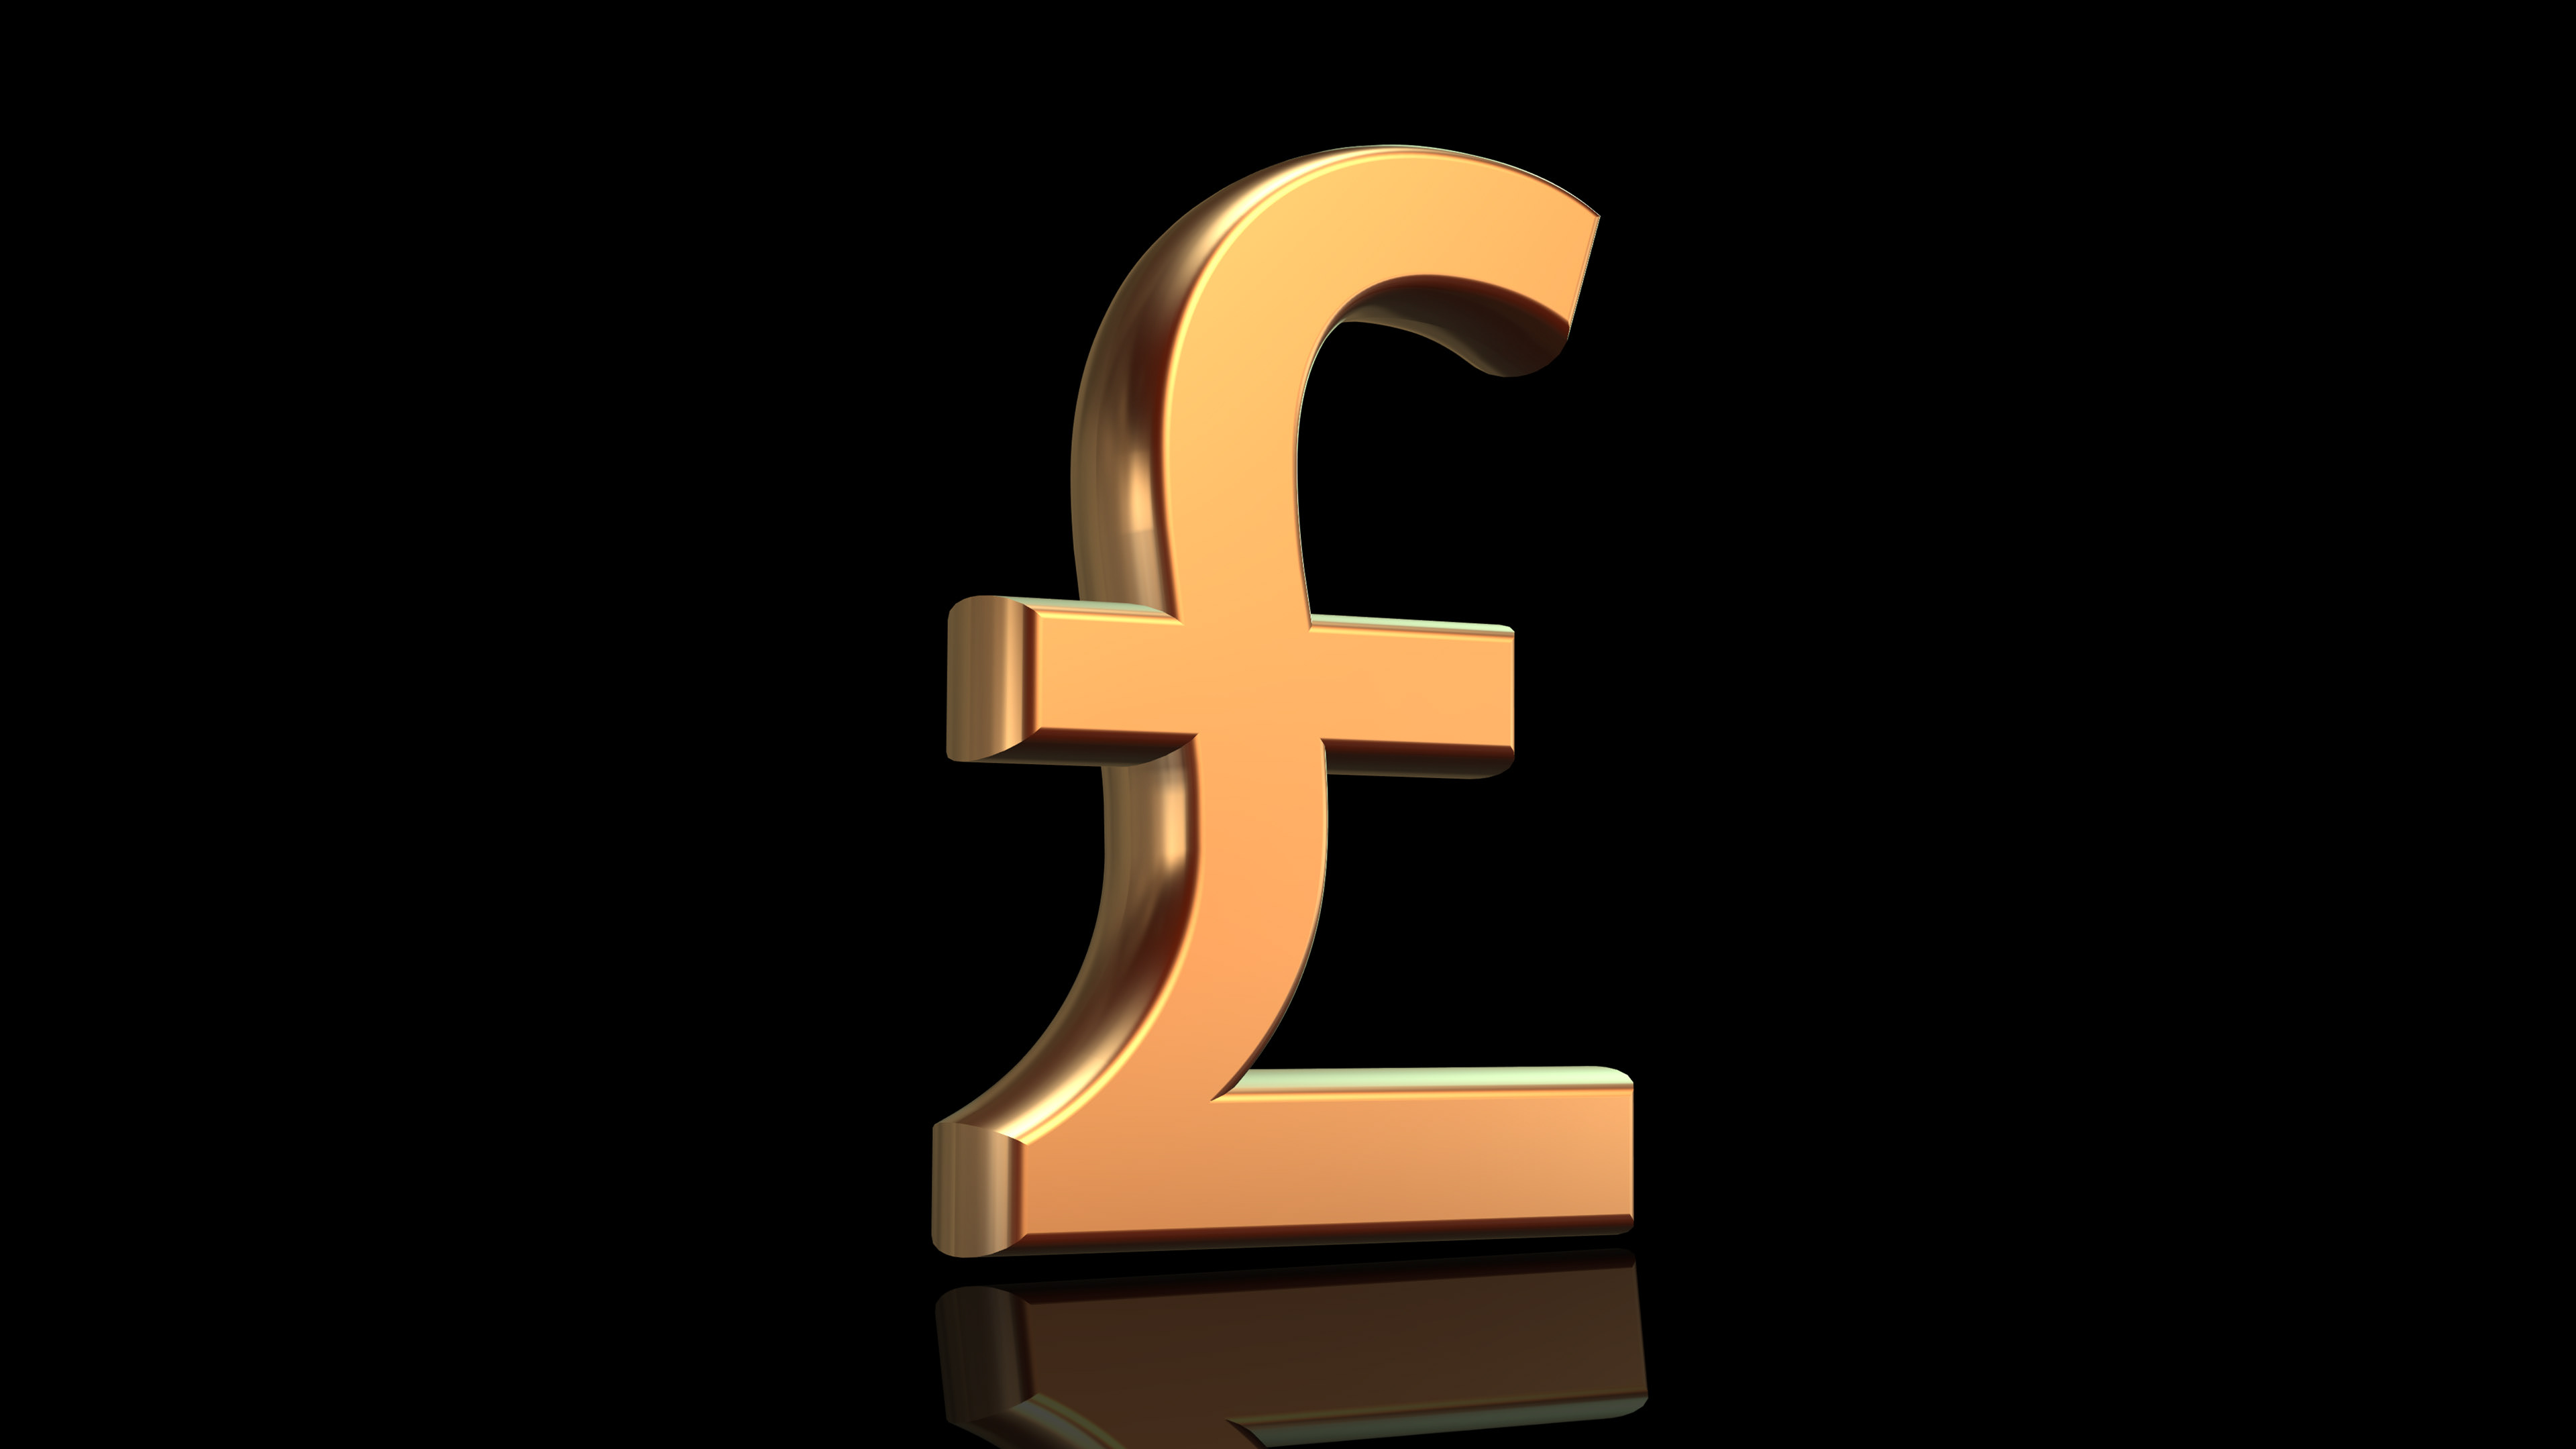 Freestyle Designworks Money Symbols Gold Currency Signs